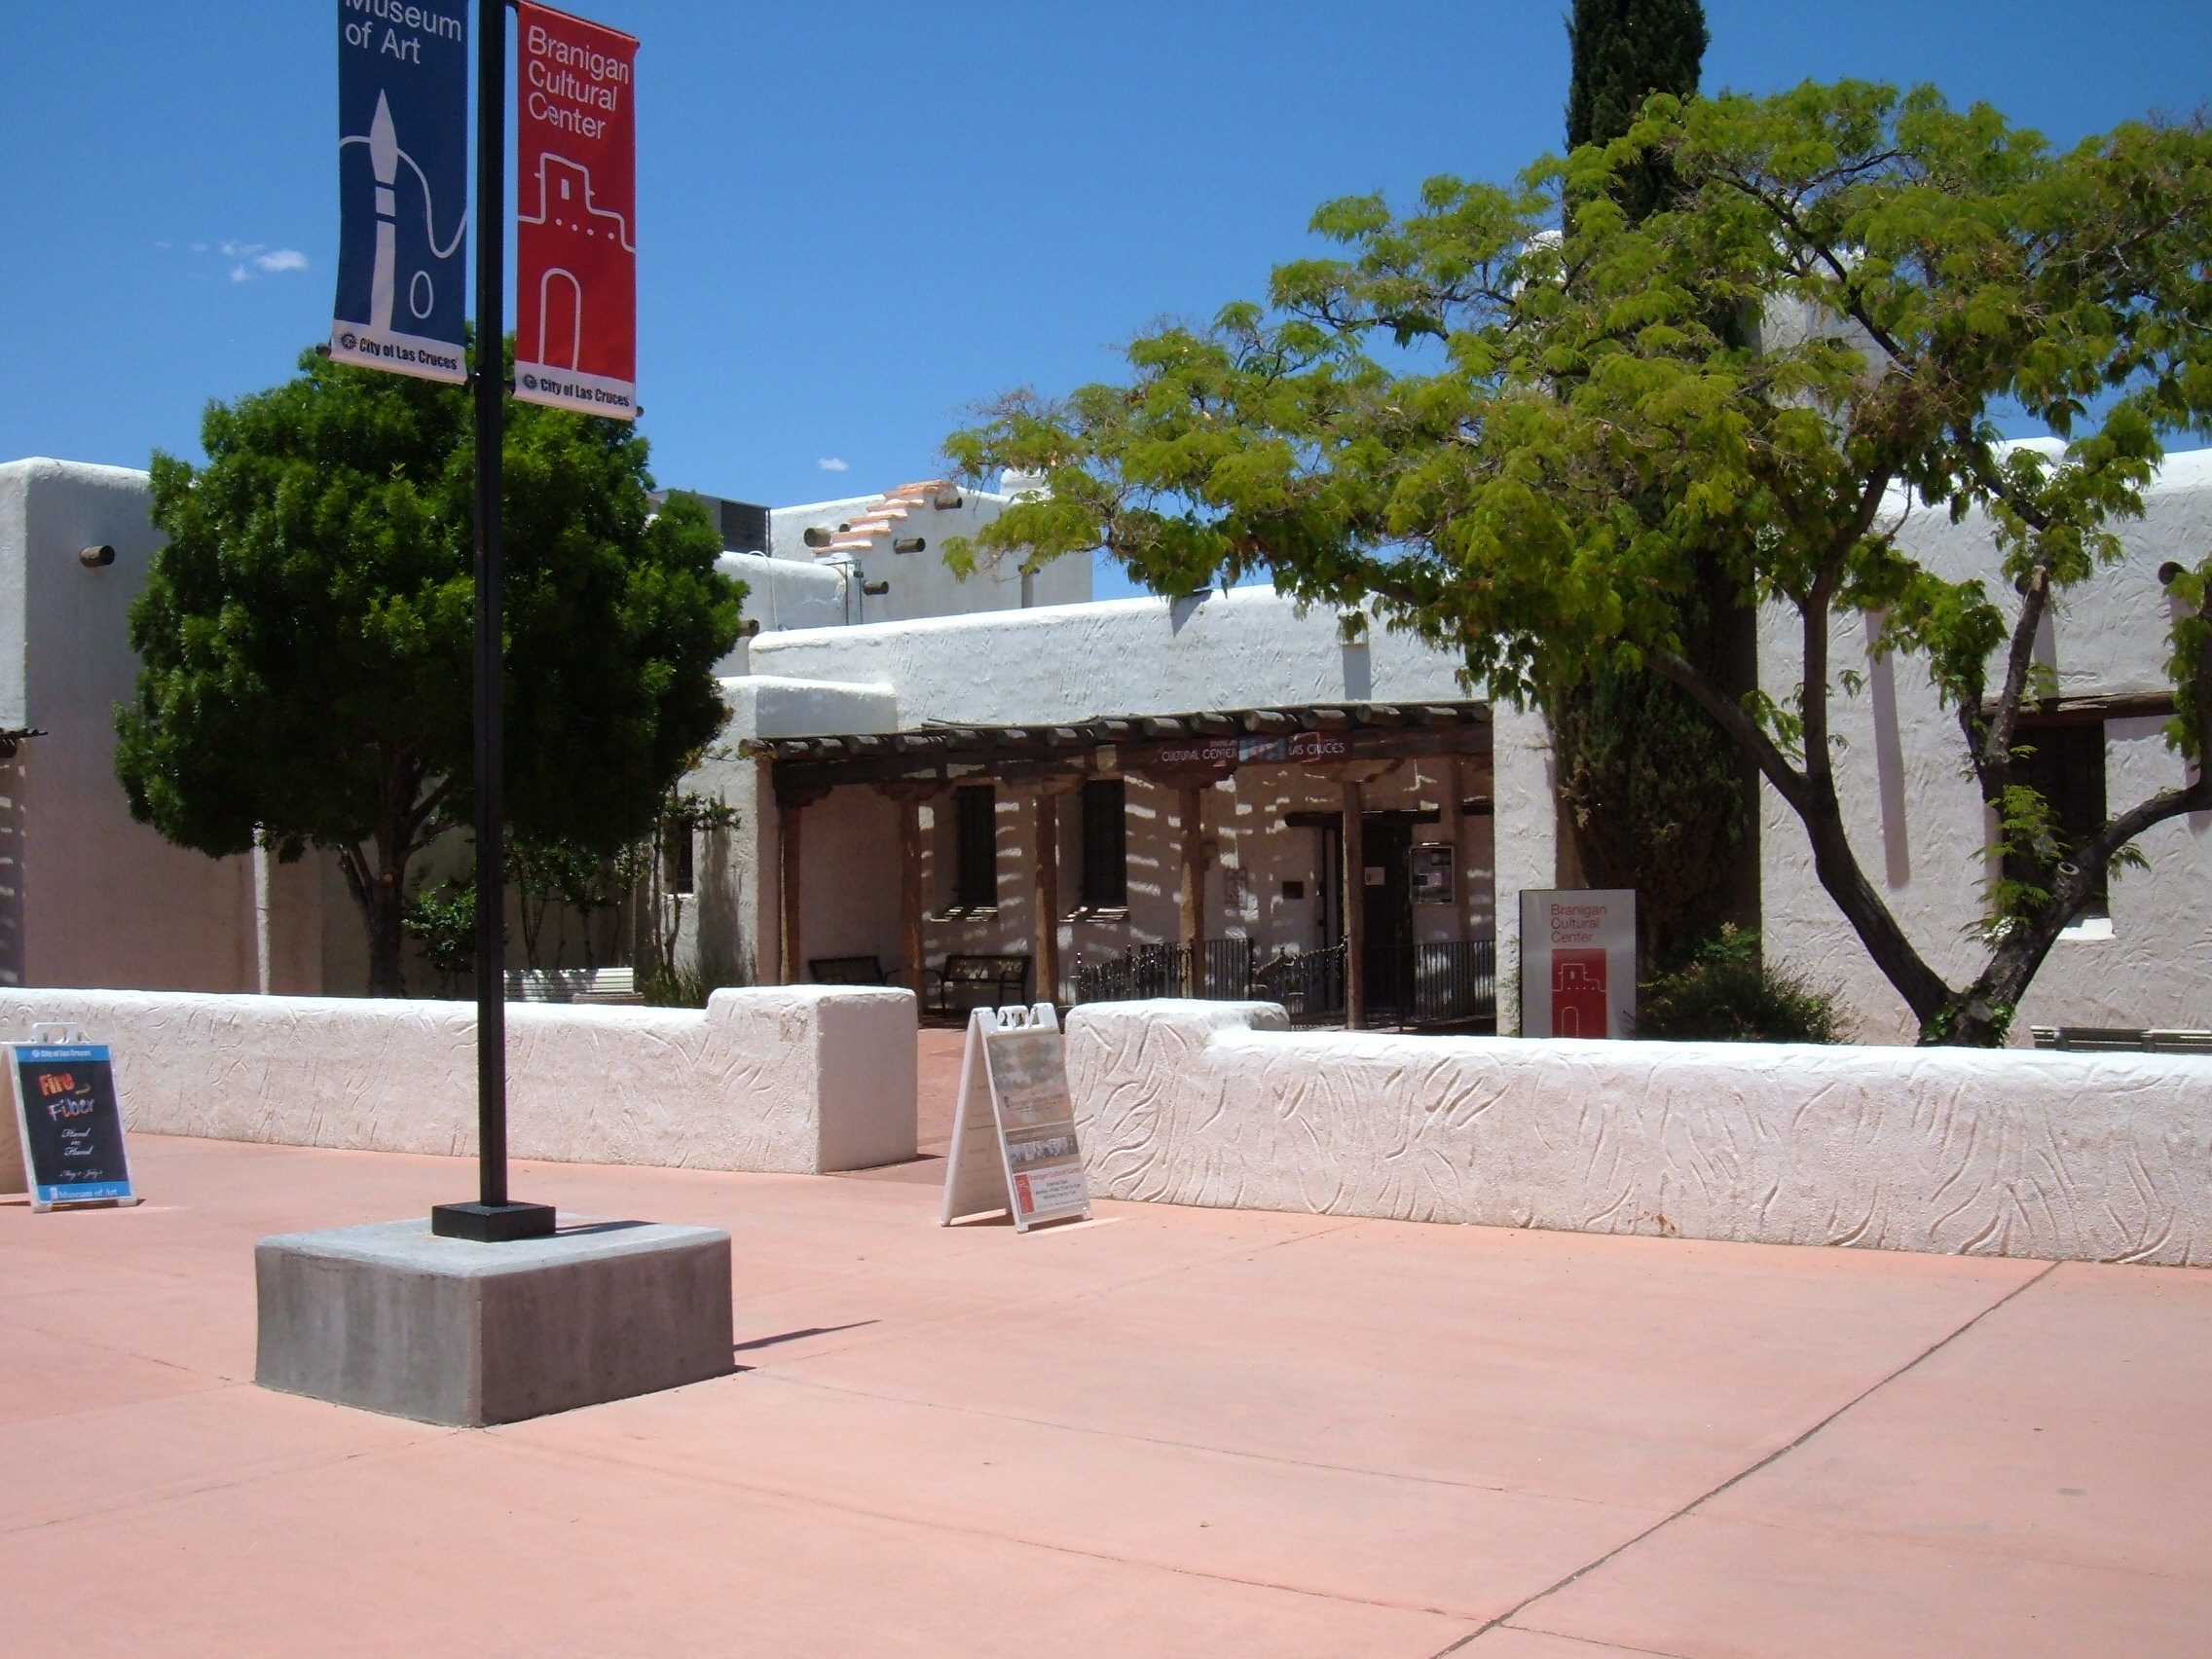 las cruces branigan cultural center